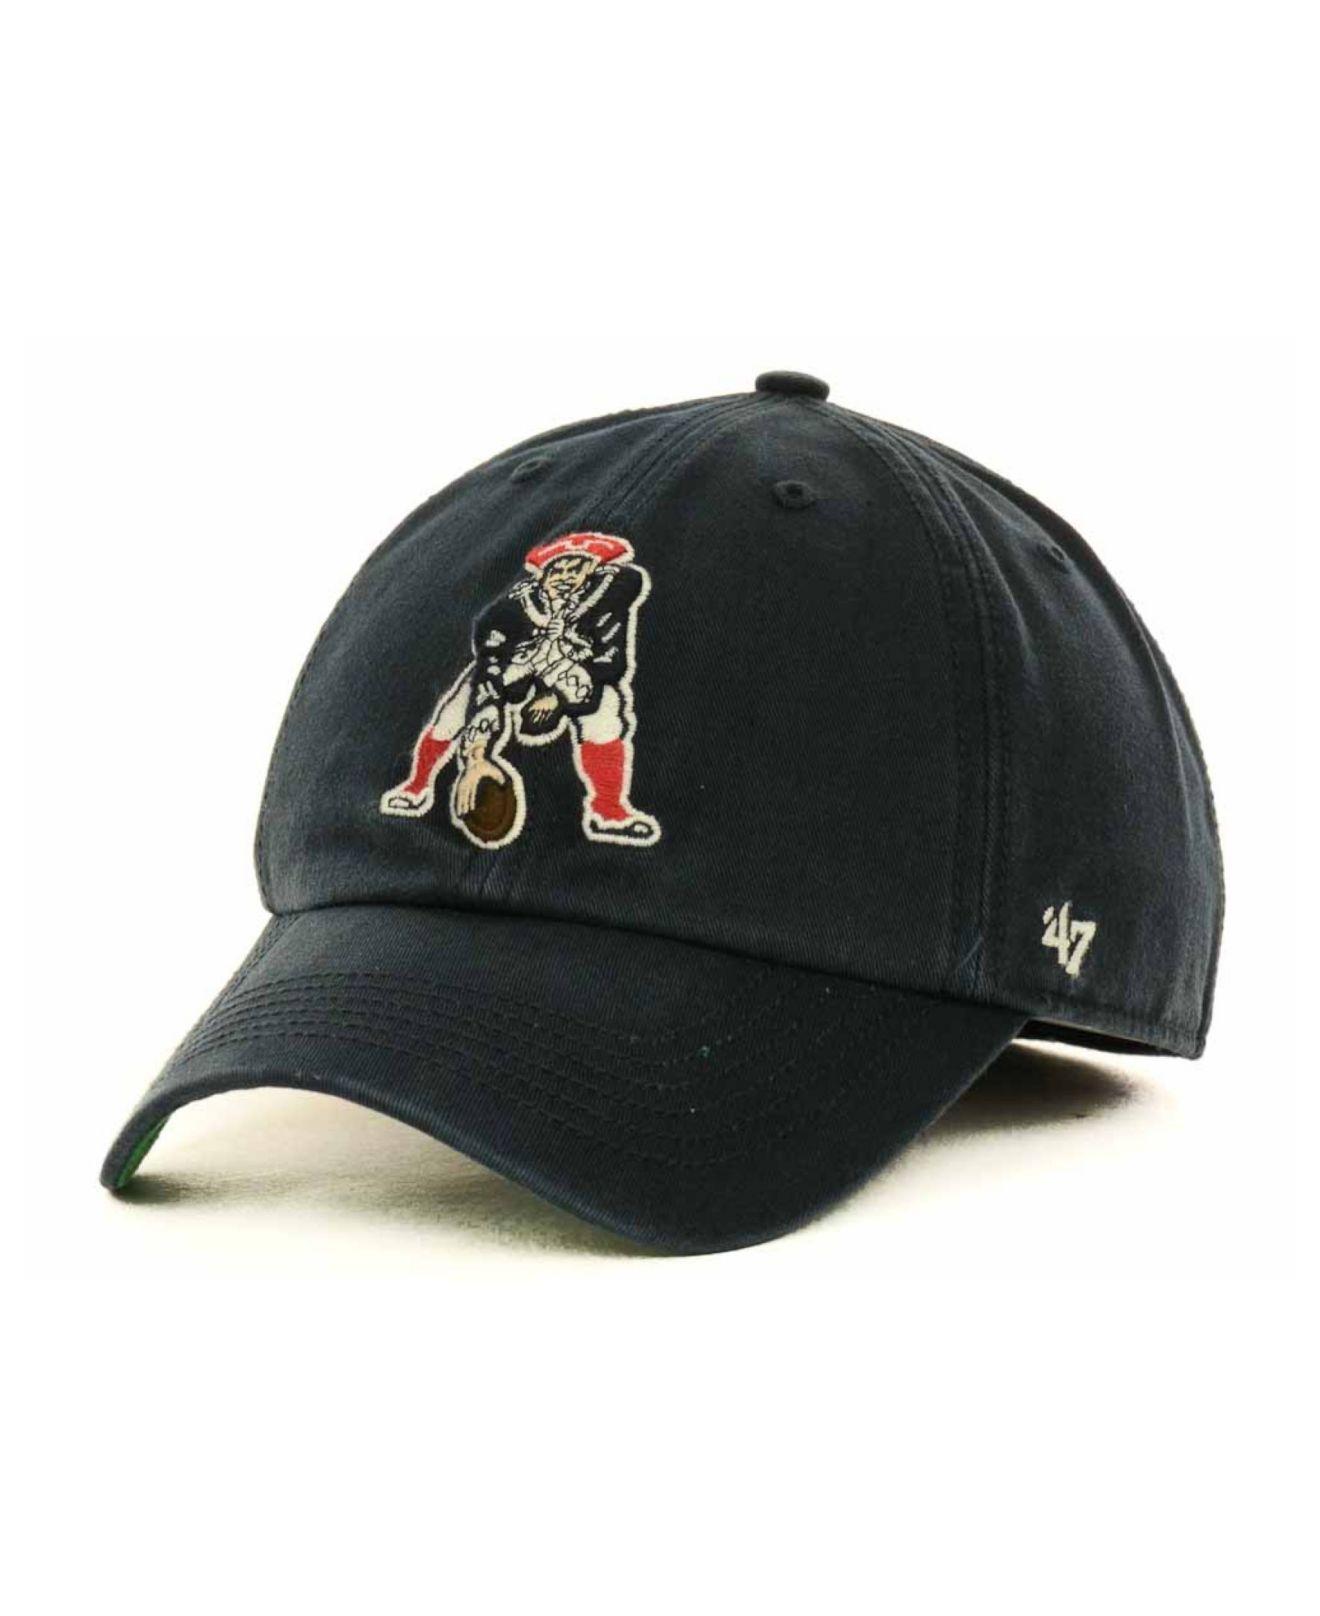 47 Brand Black Alabama Crimson Tide Clean Up Cap Product 1 20069316 3 -  canada goose hats 47 brand